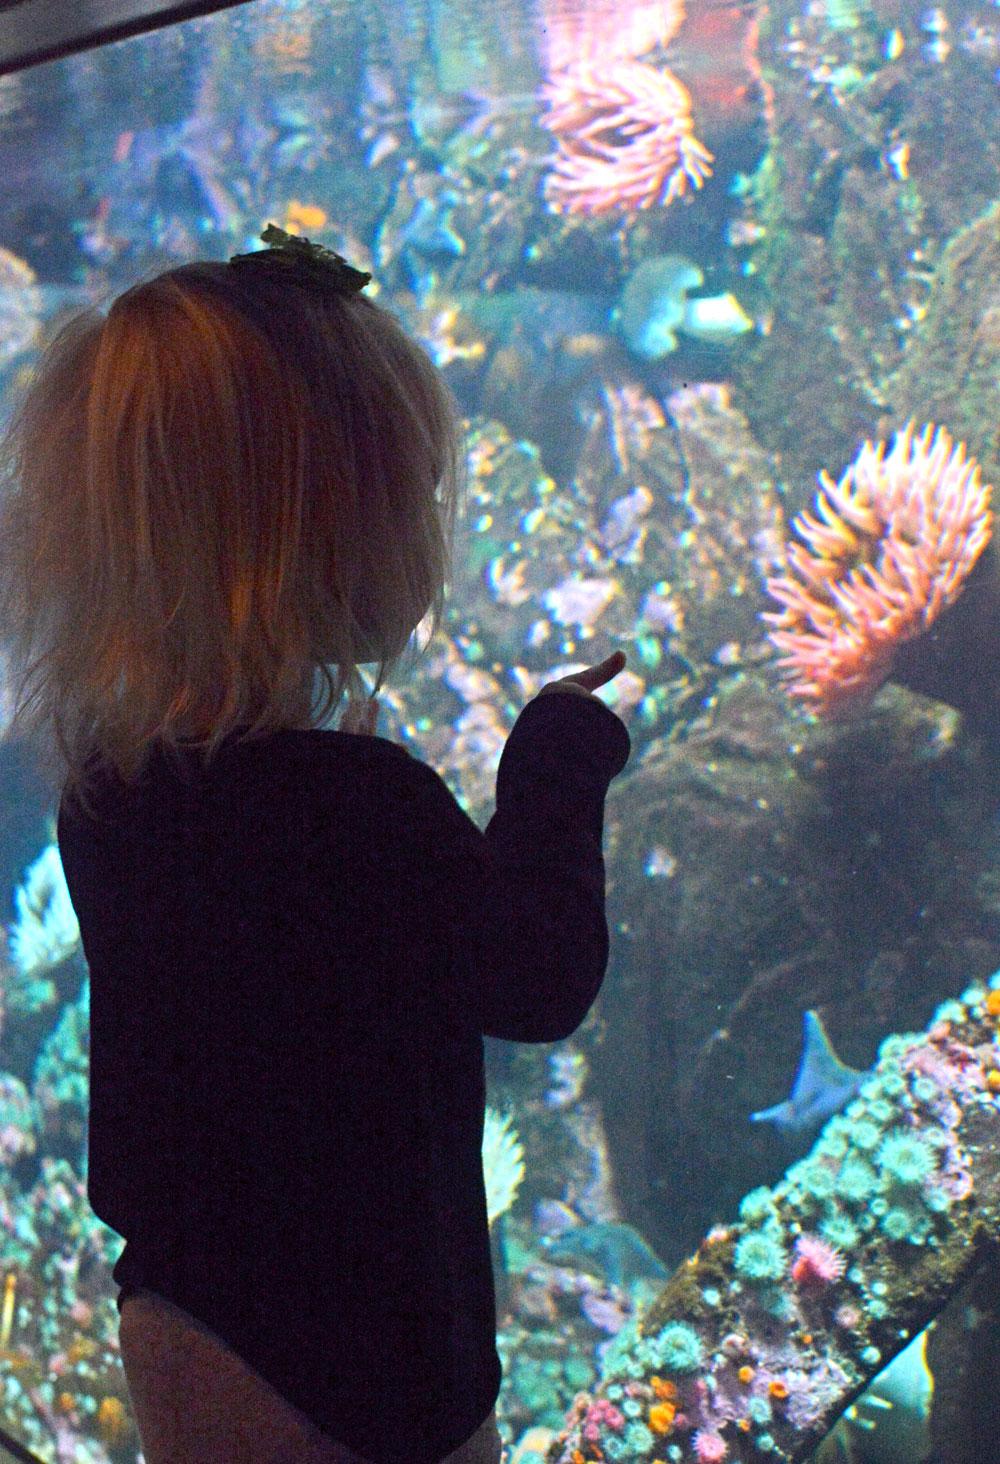 Vancouver Aquarium star fish and sea anemones - Mommy Scene